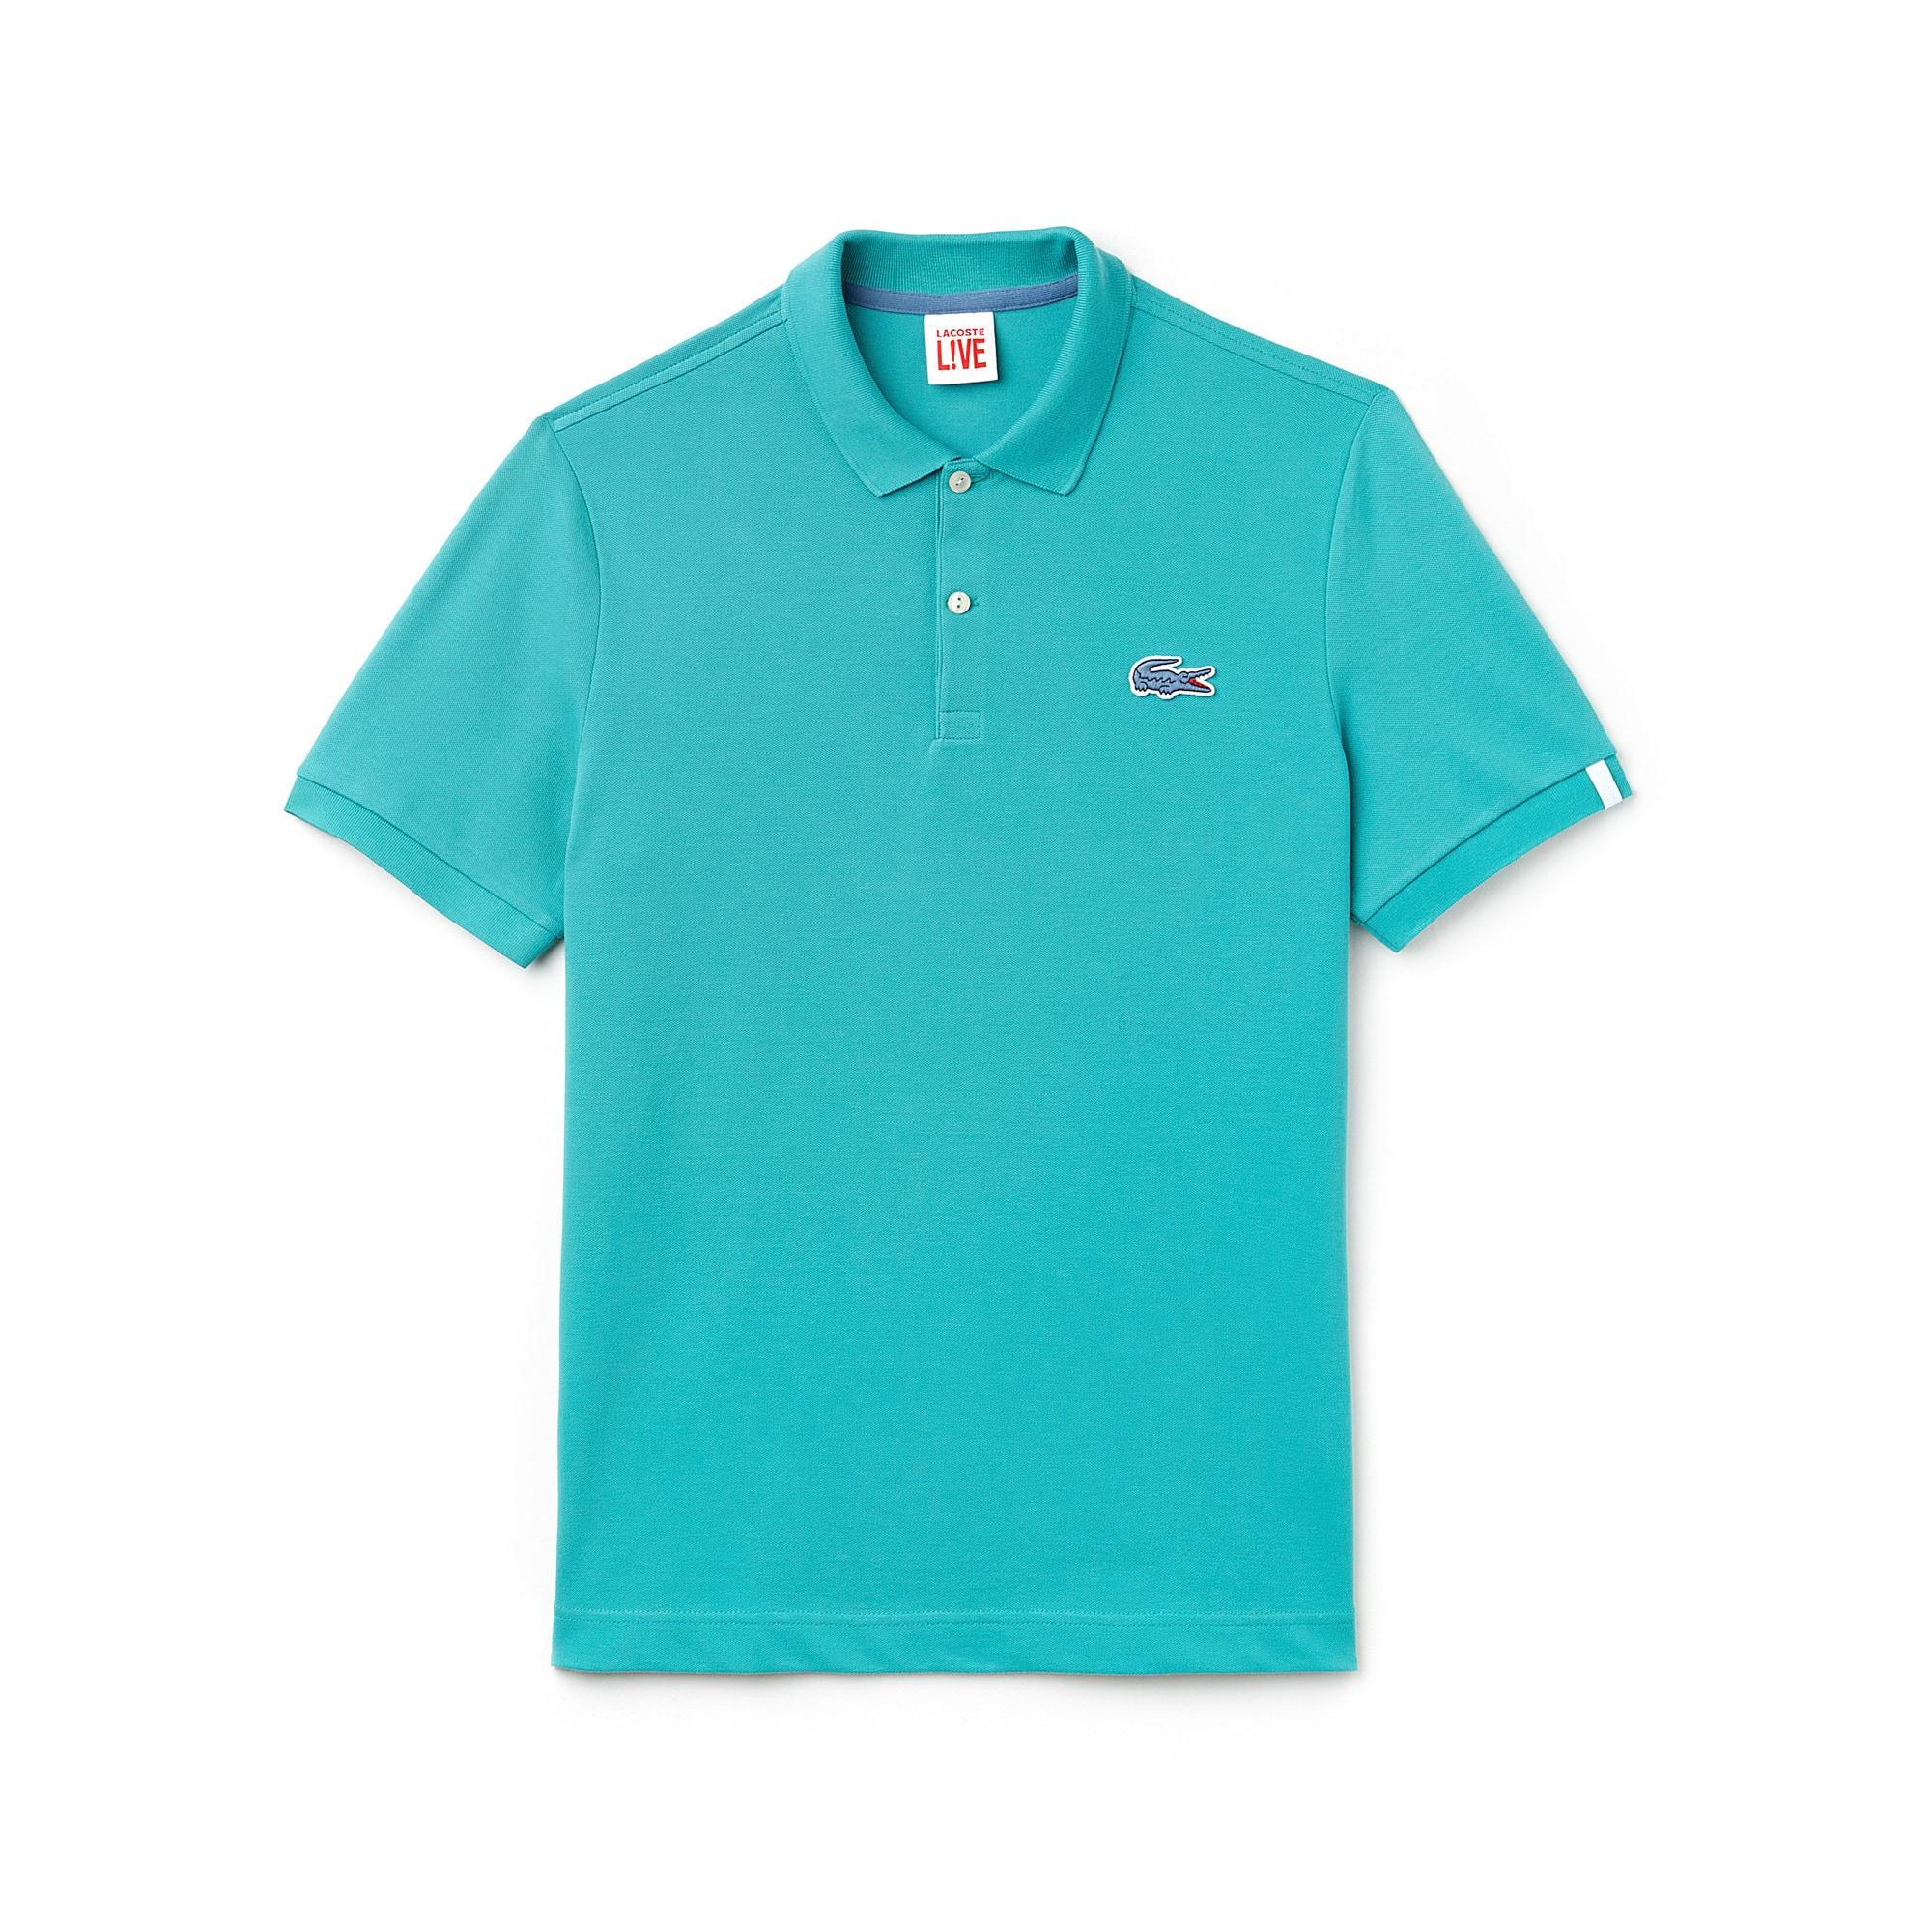 Slim Fit Herren-Poloshirt aus Mini-Piqué mit Stretch LACOSTE L!VE